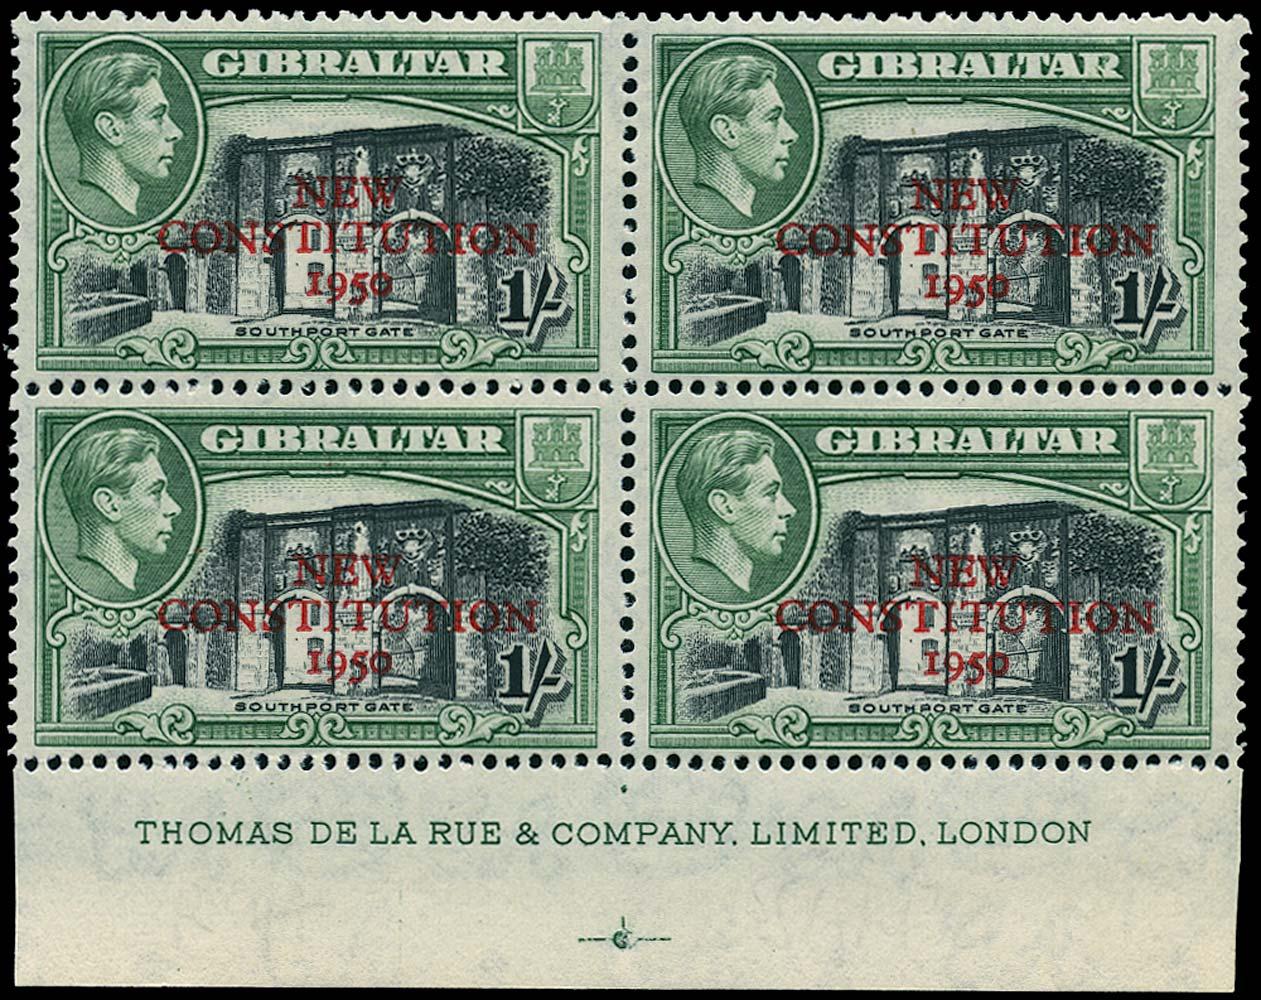 GIBRALTAR 1950  SG143a Mint New Constitution 1s variety Broken R